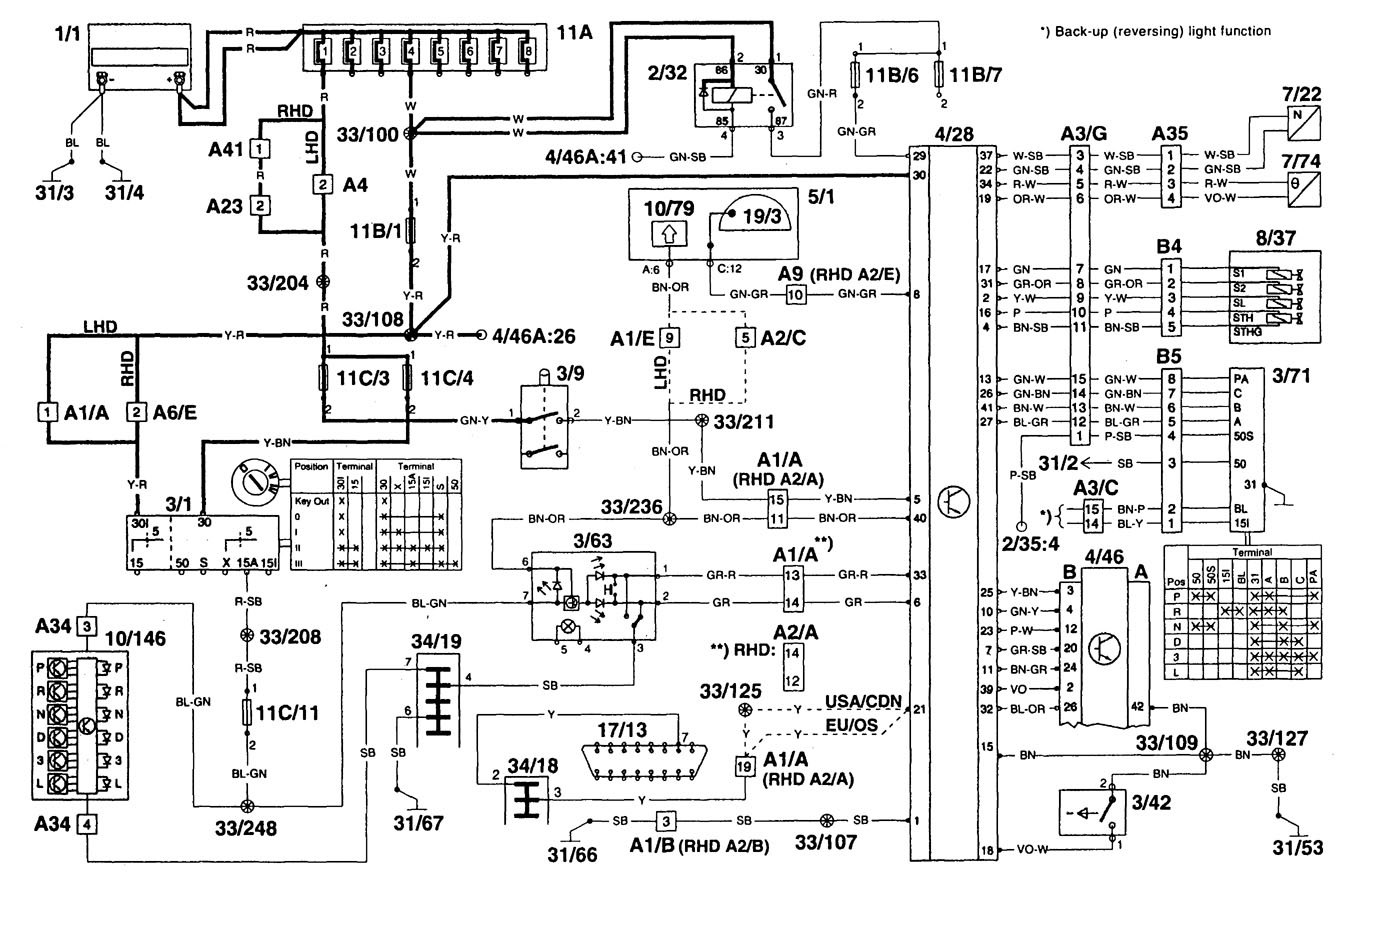 1997 nissan 200sx wiring diagram volvo v90  1997 1998  wiring diagrams transmission controls  volvo v90  1997 1998  wiring